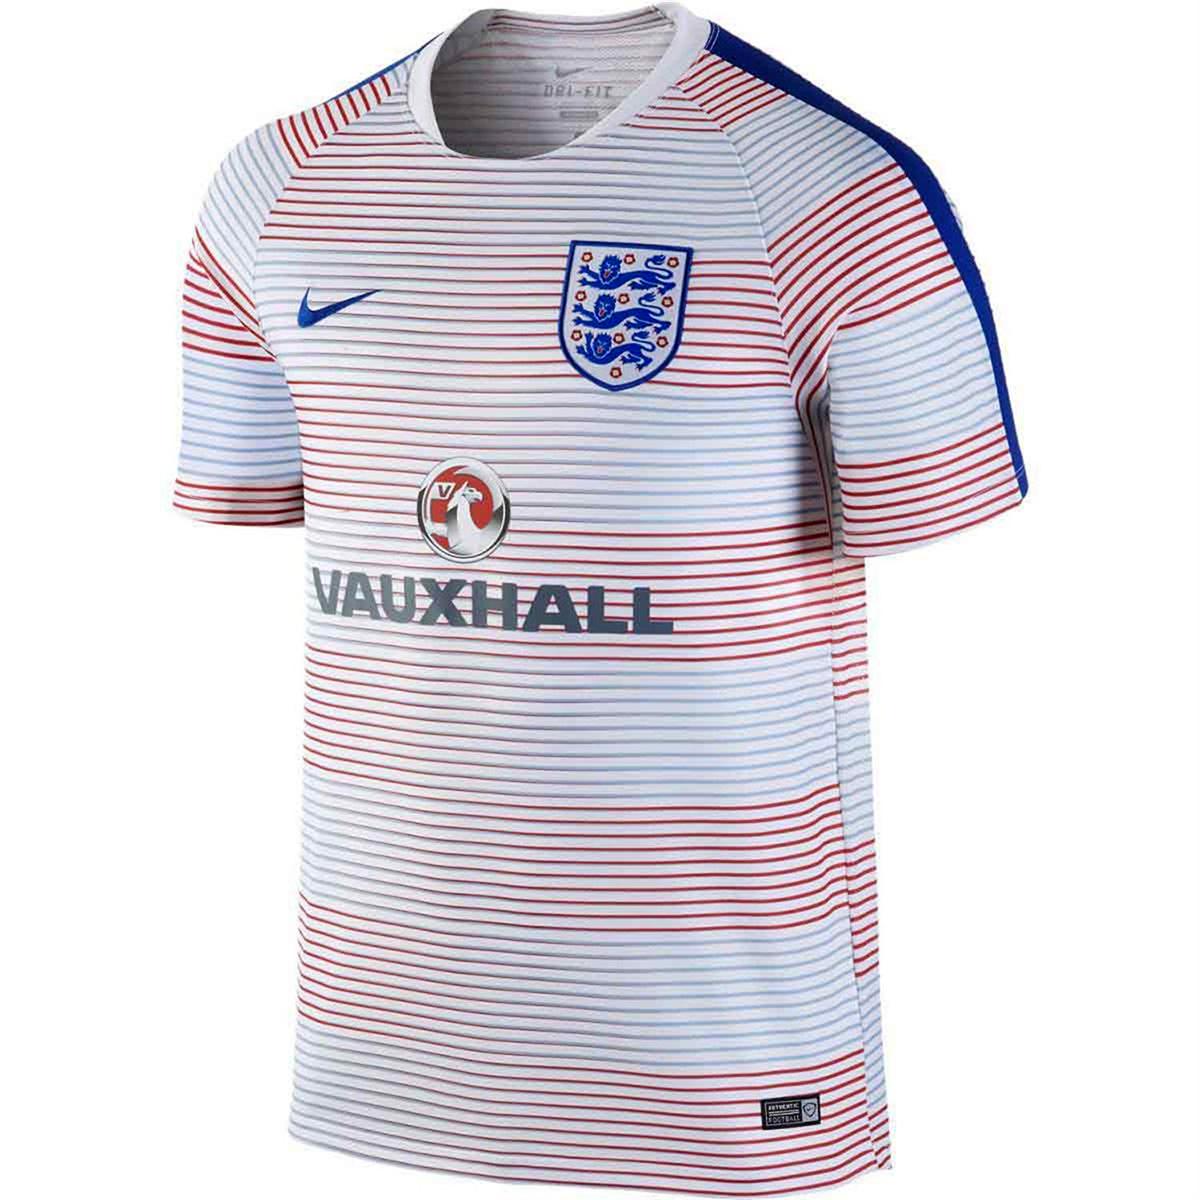 a6b344f08f4 Nike England Flash Pre-Match SS 2 Tee - Soccer Shop WORLD CUP 2018  MERCHANDISE - Superfanas.lt